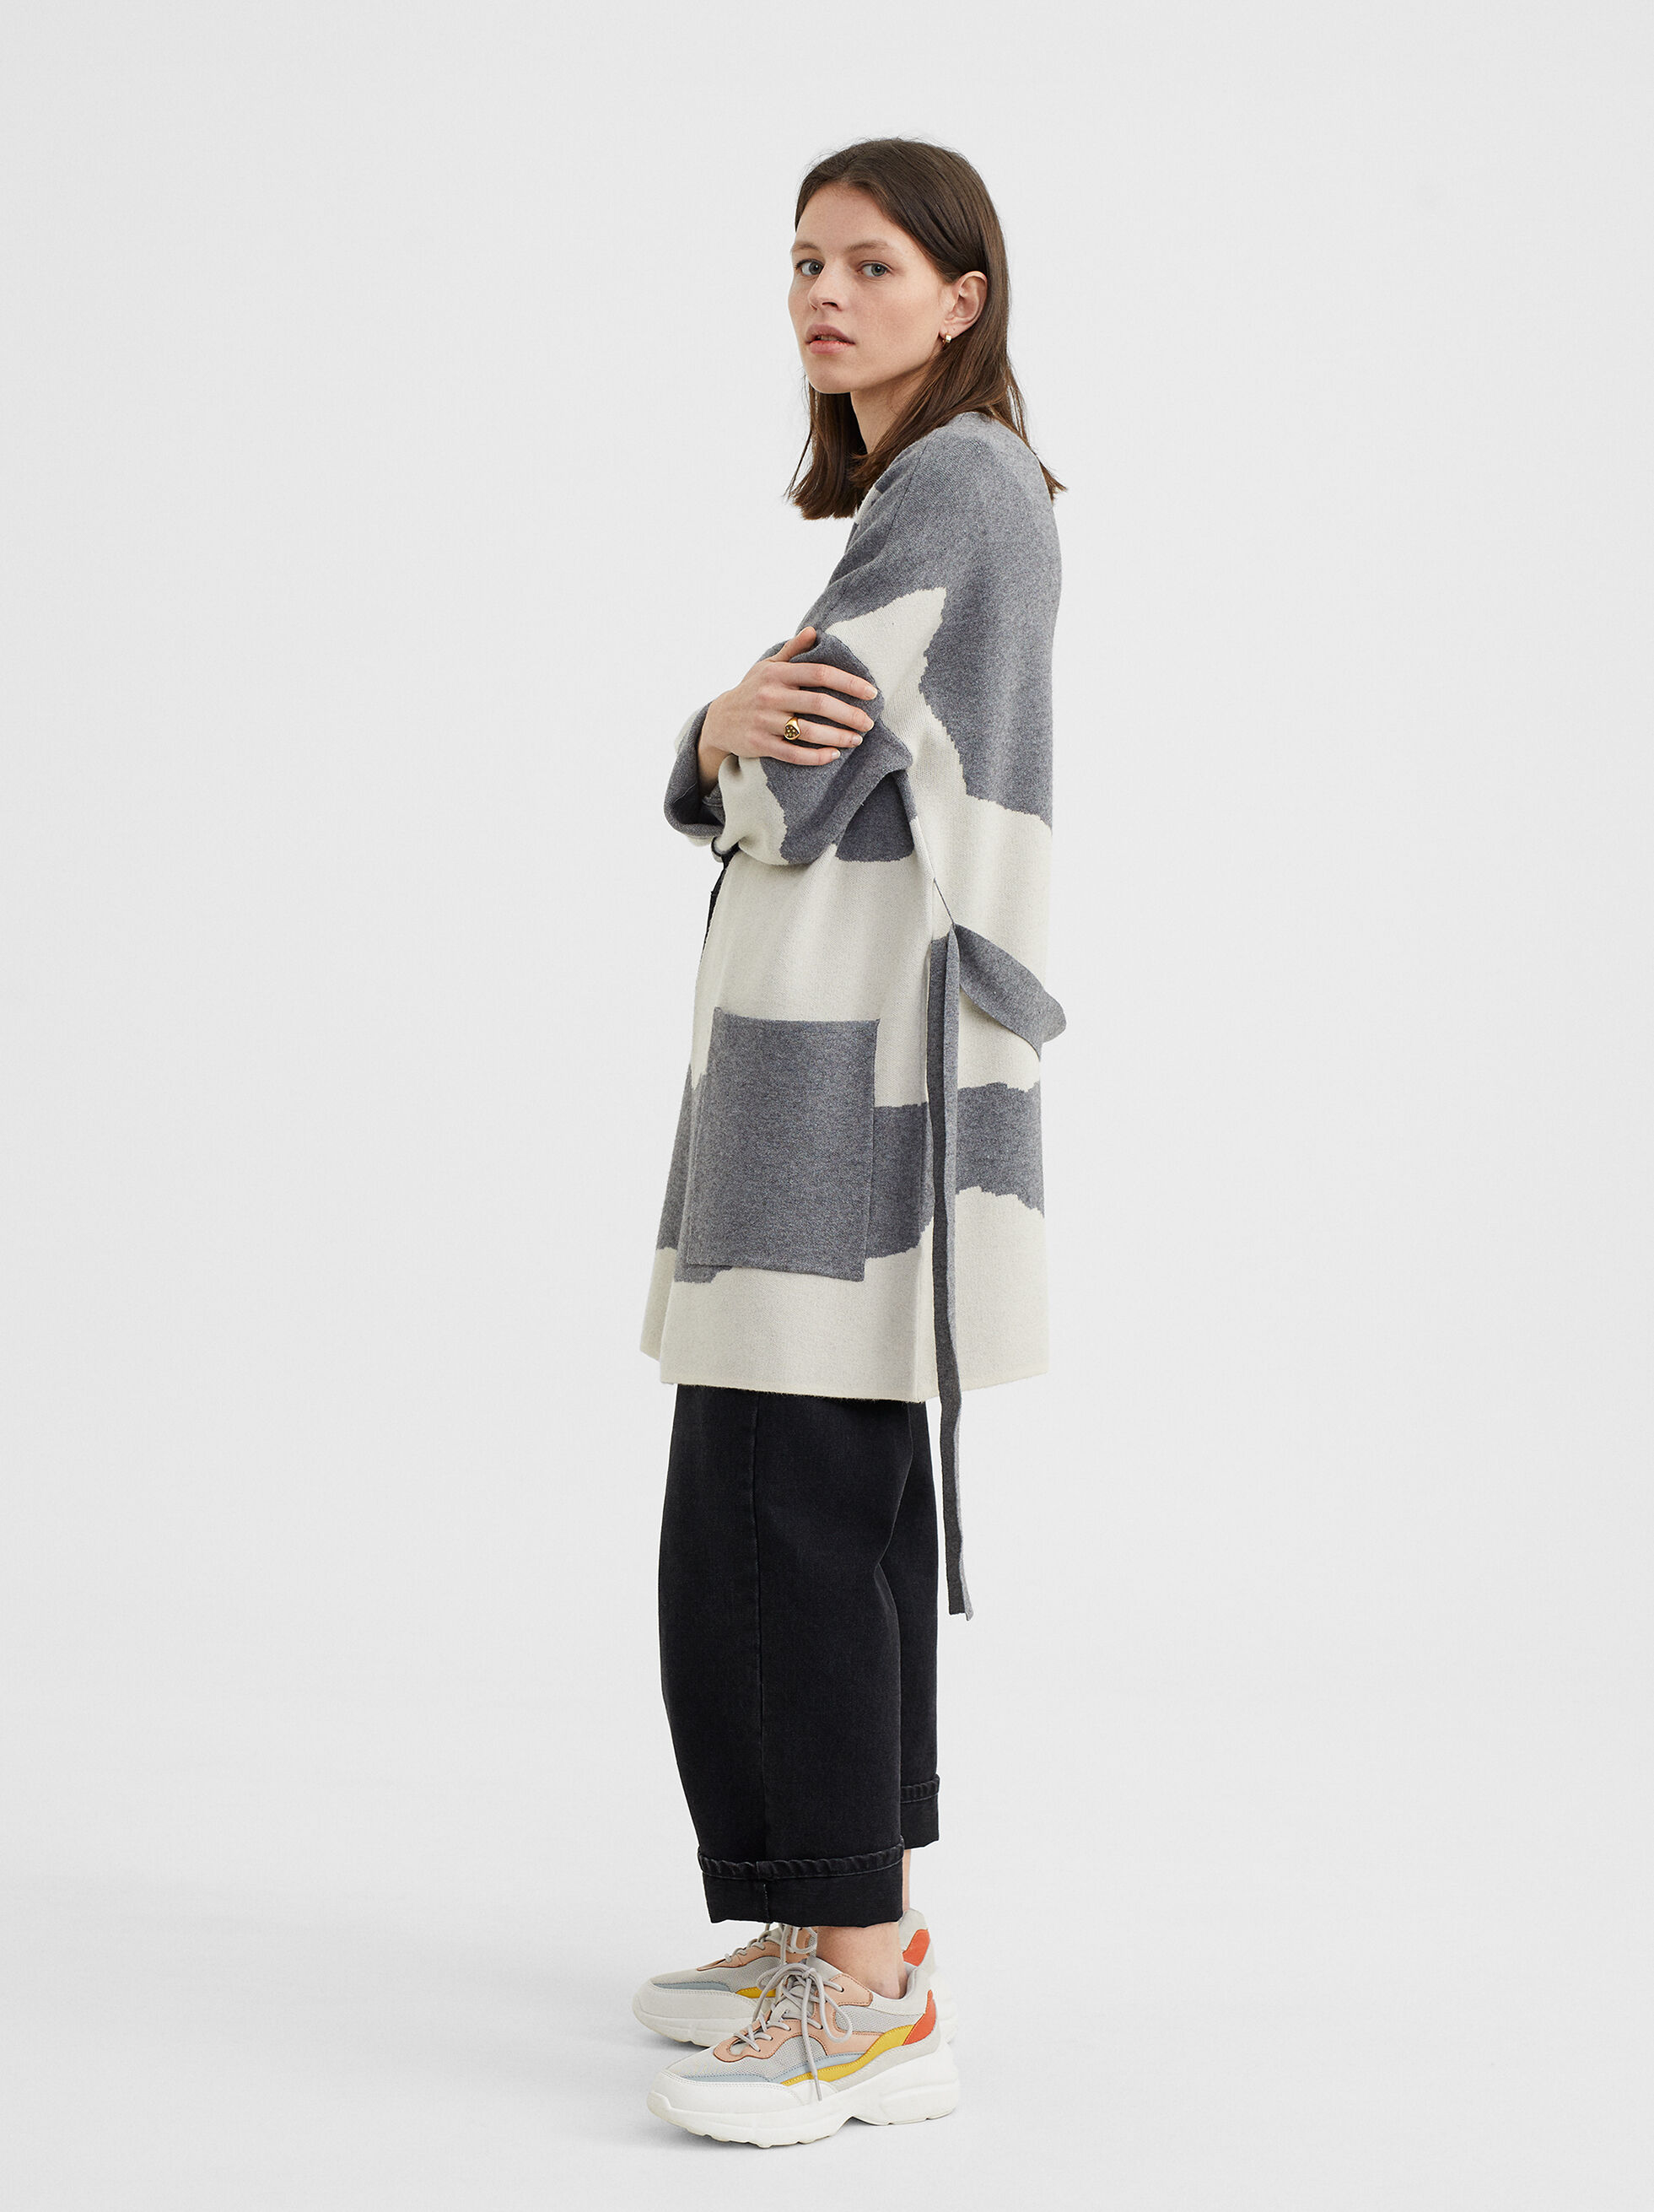 Knit Kimono With Belt, Grey, hi-res